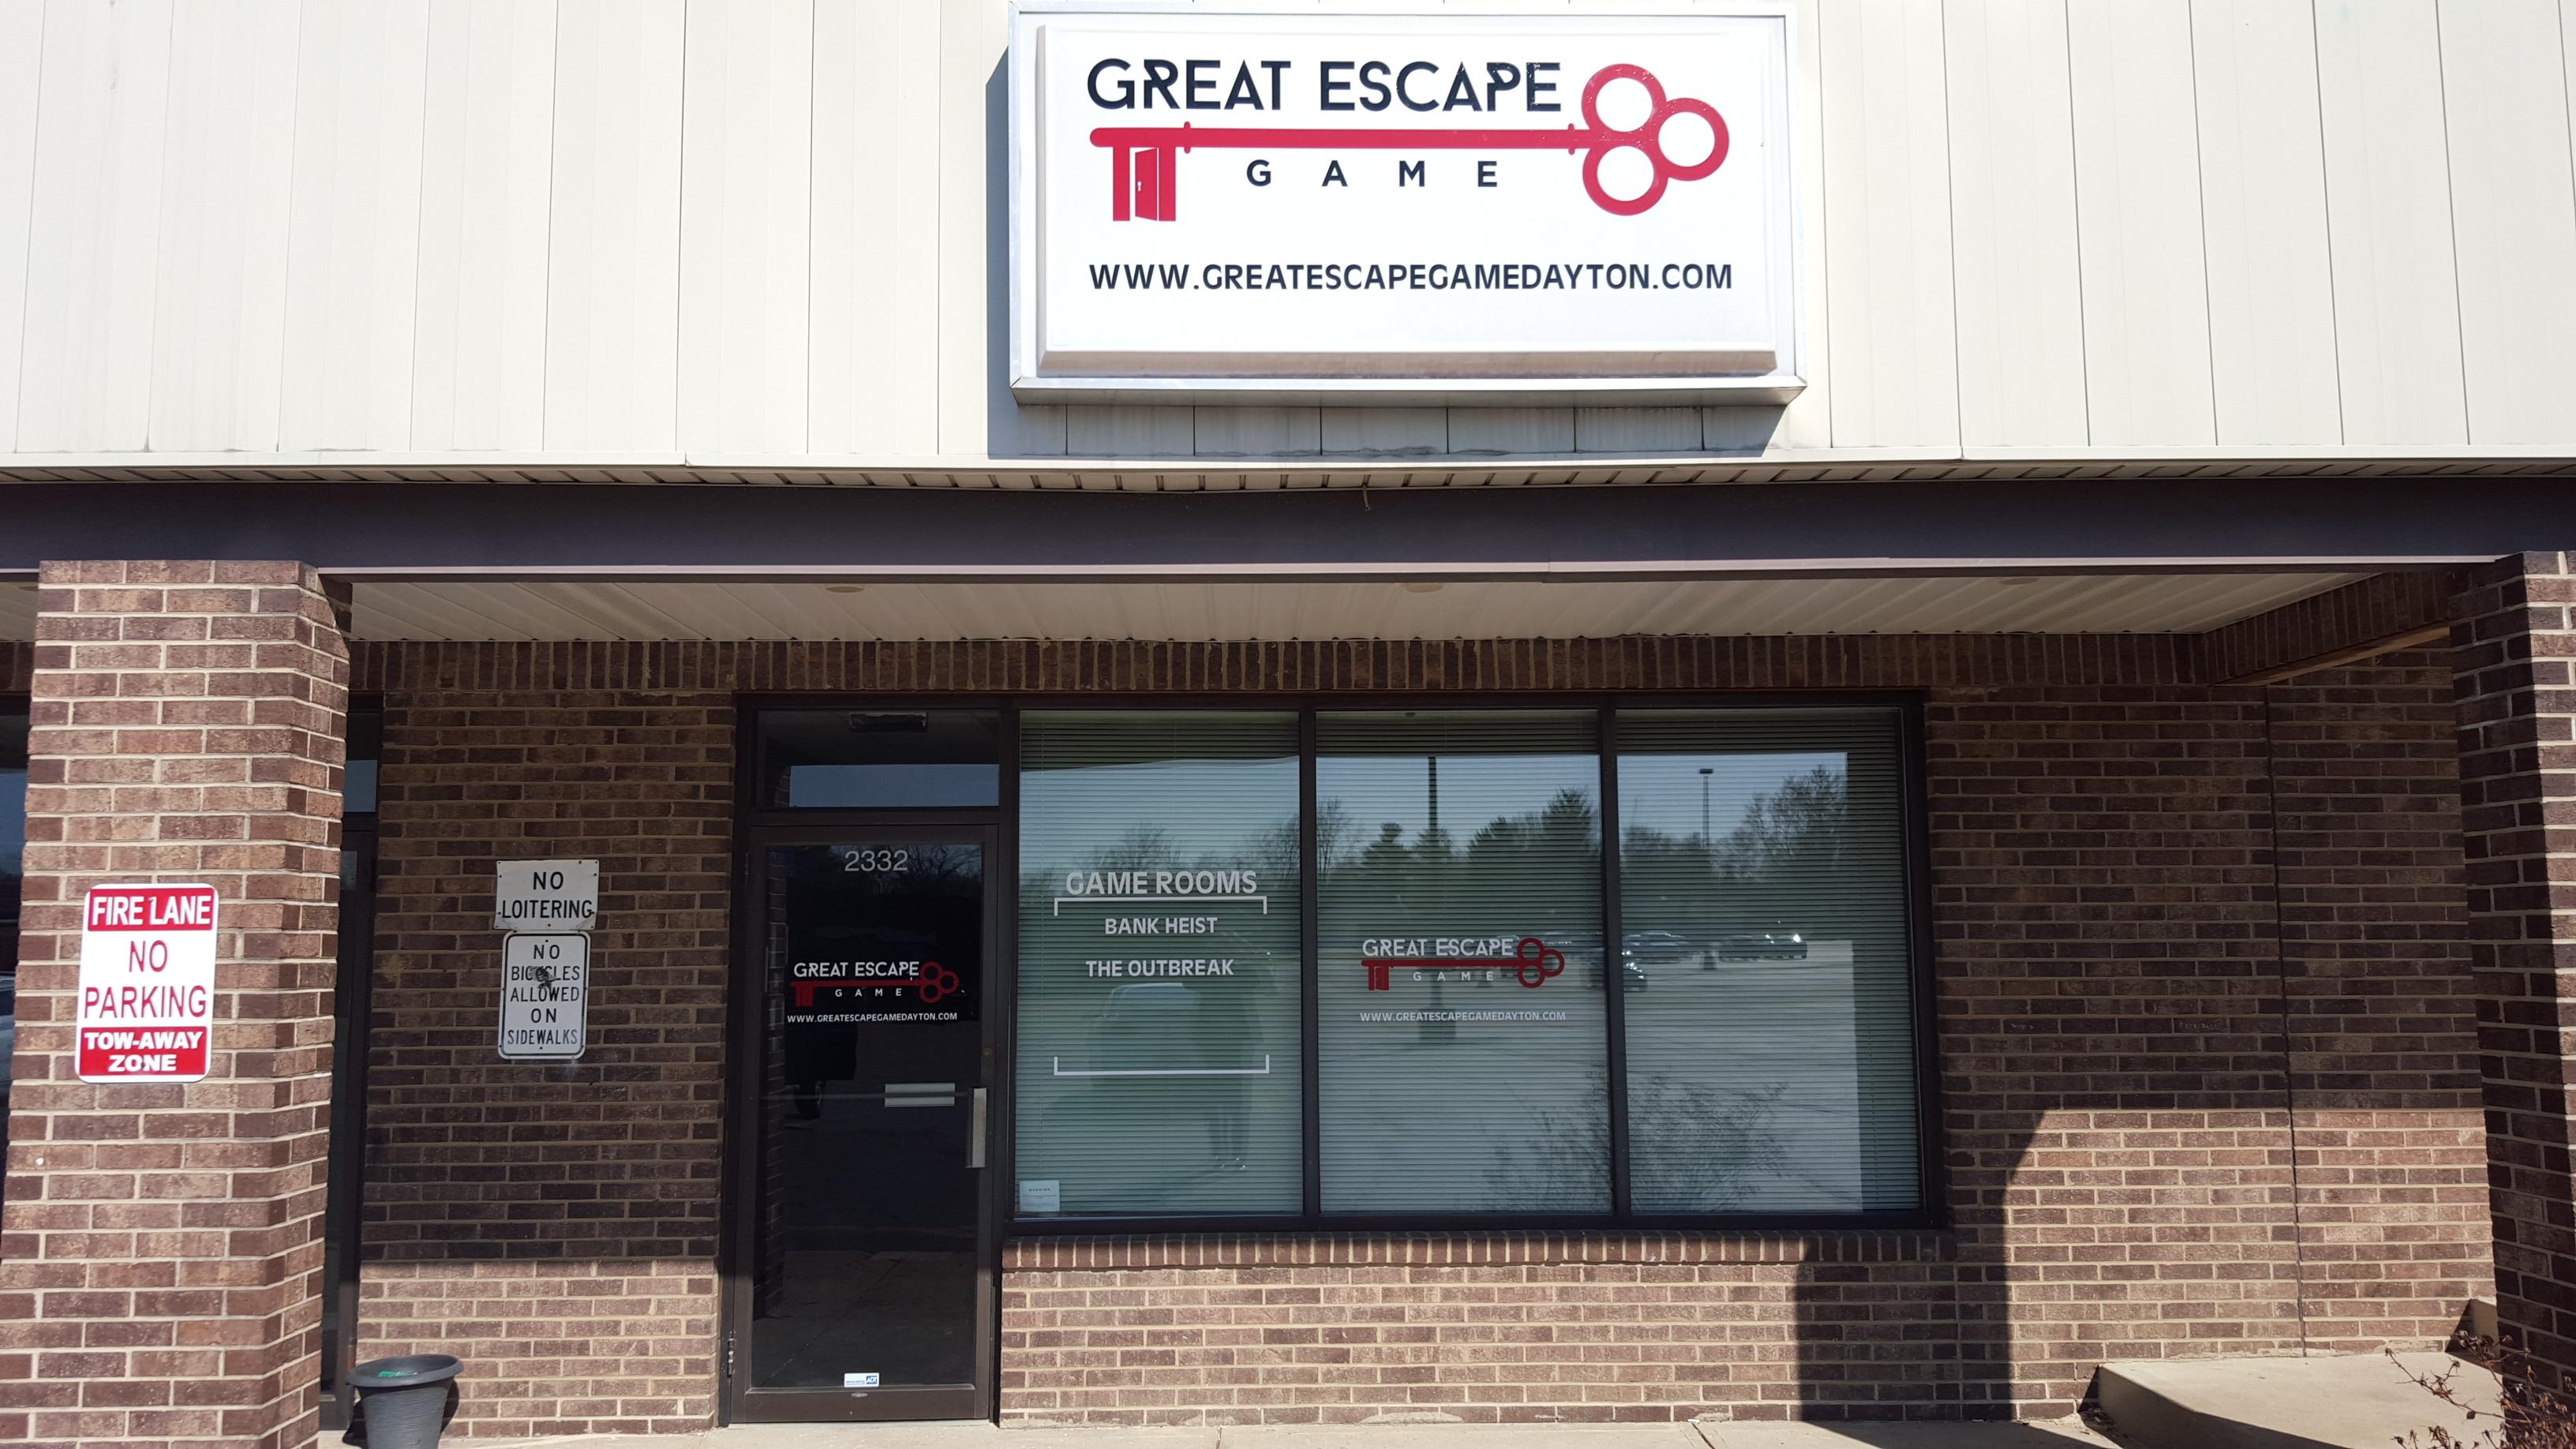 Great Escape Game Dayton image 2